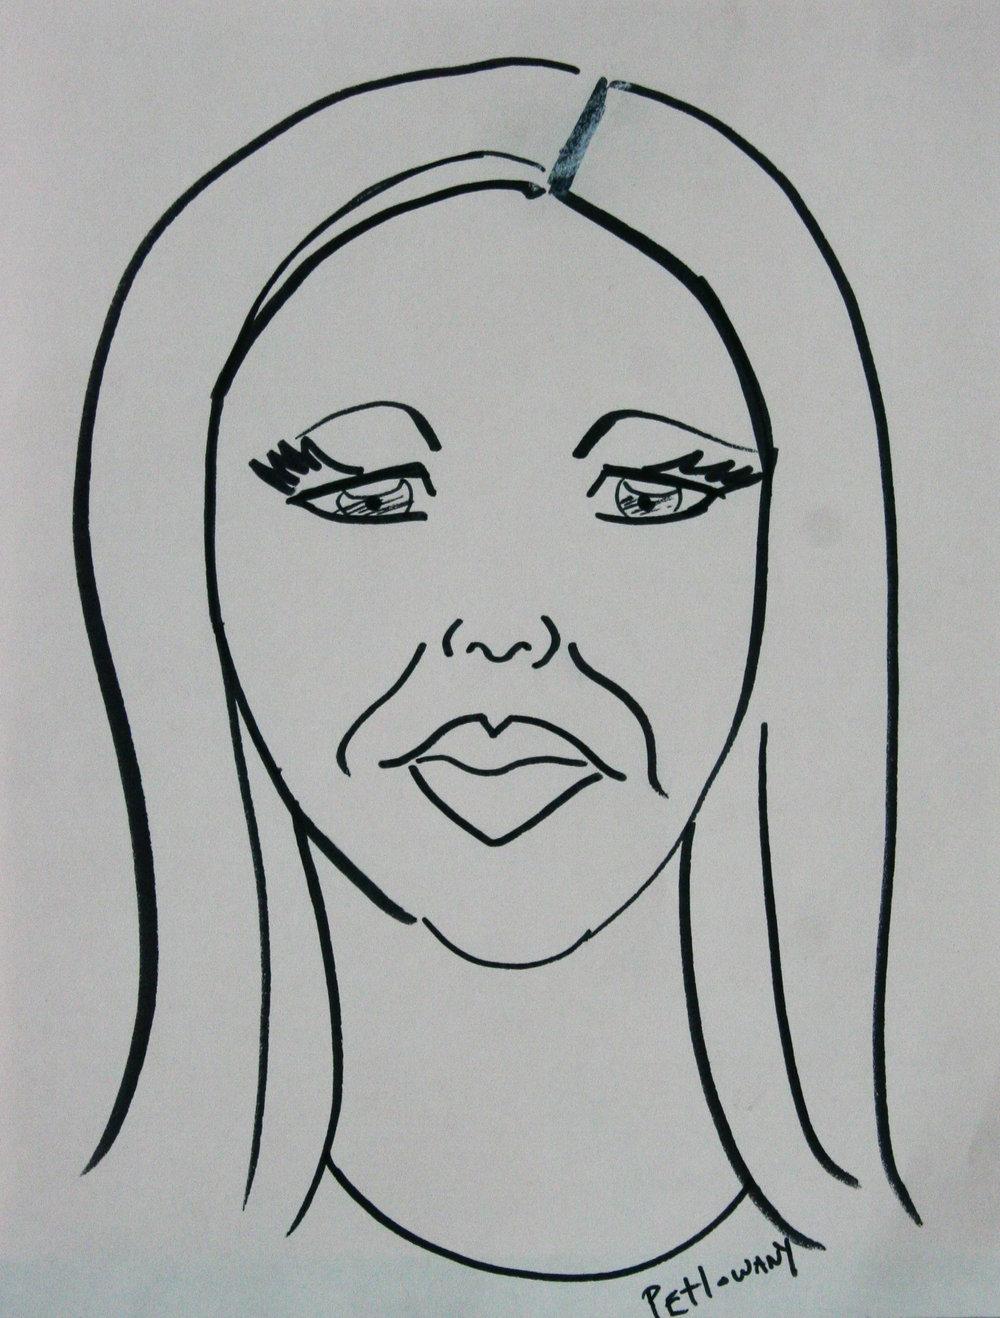 Paula Petlowany did this caricature drawing.